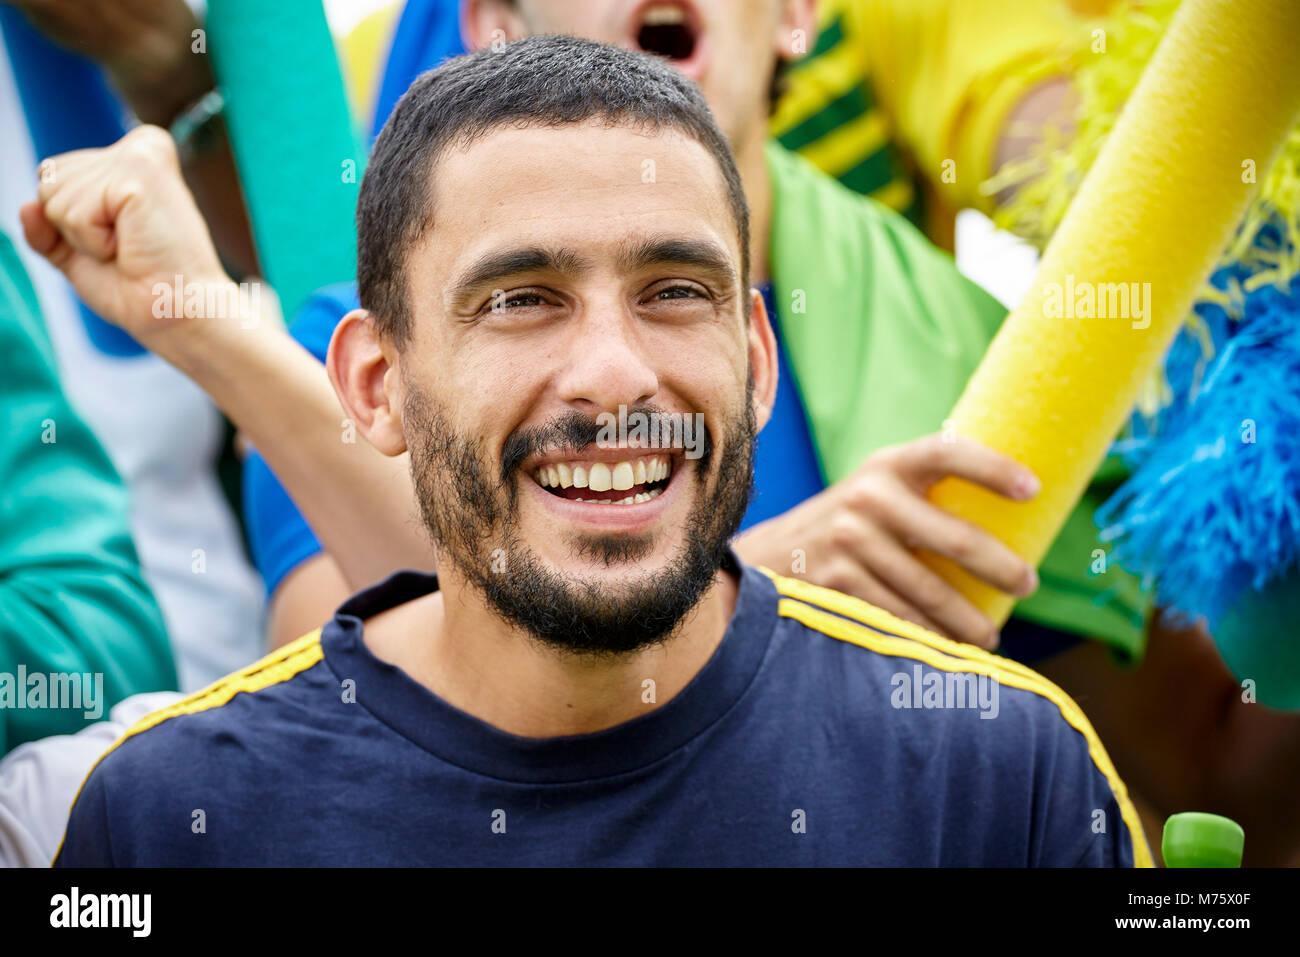 Mann fröhlich lächelnd an Fußballspiel, Porträt Stockbild